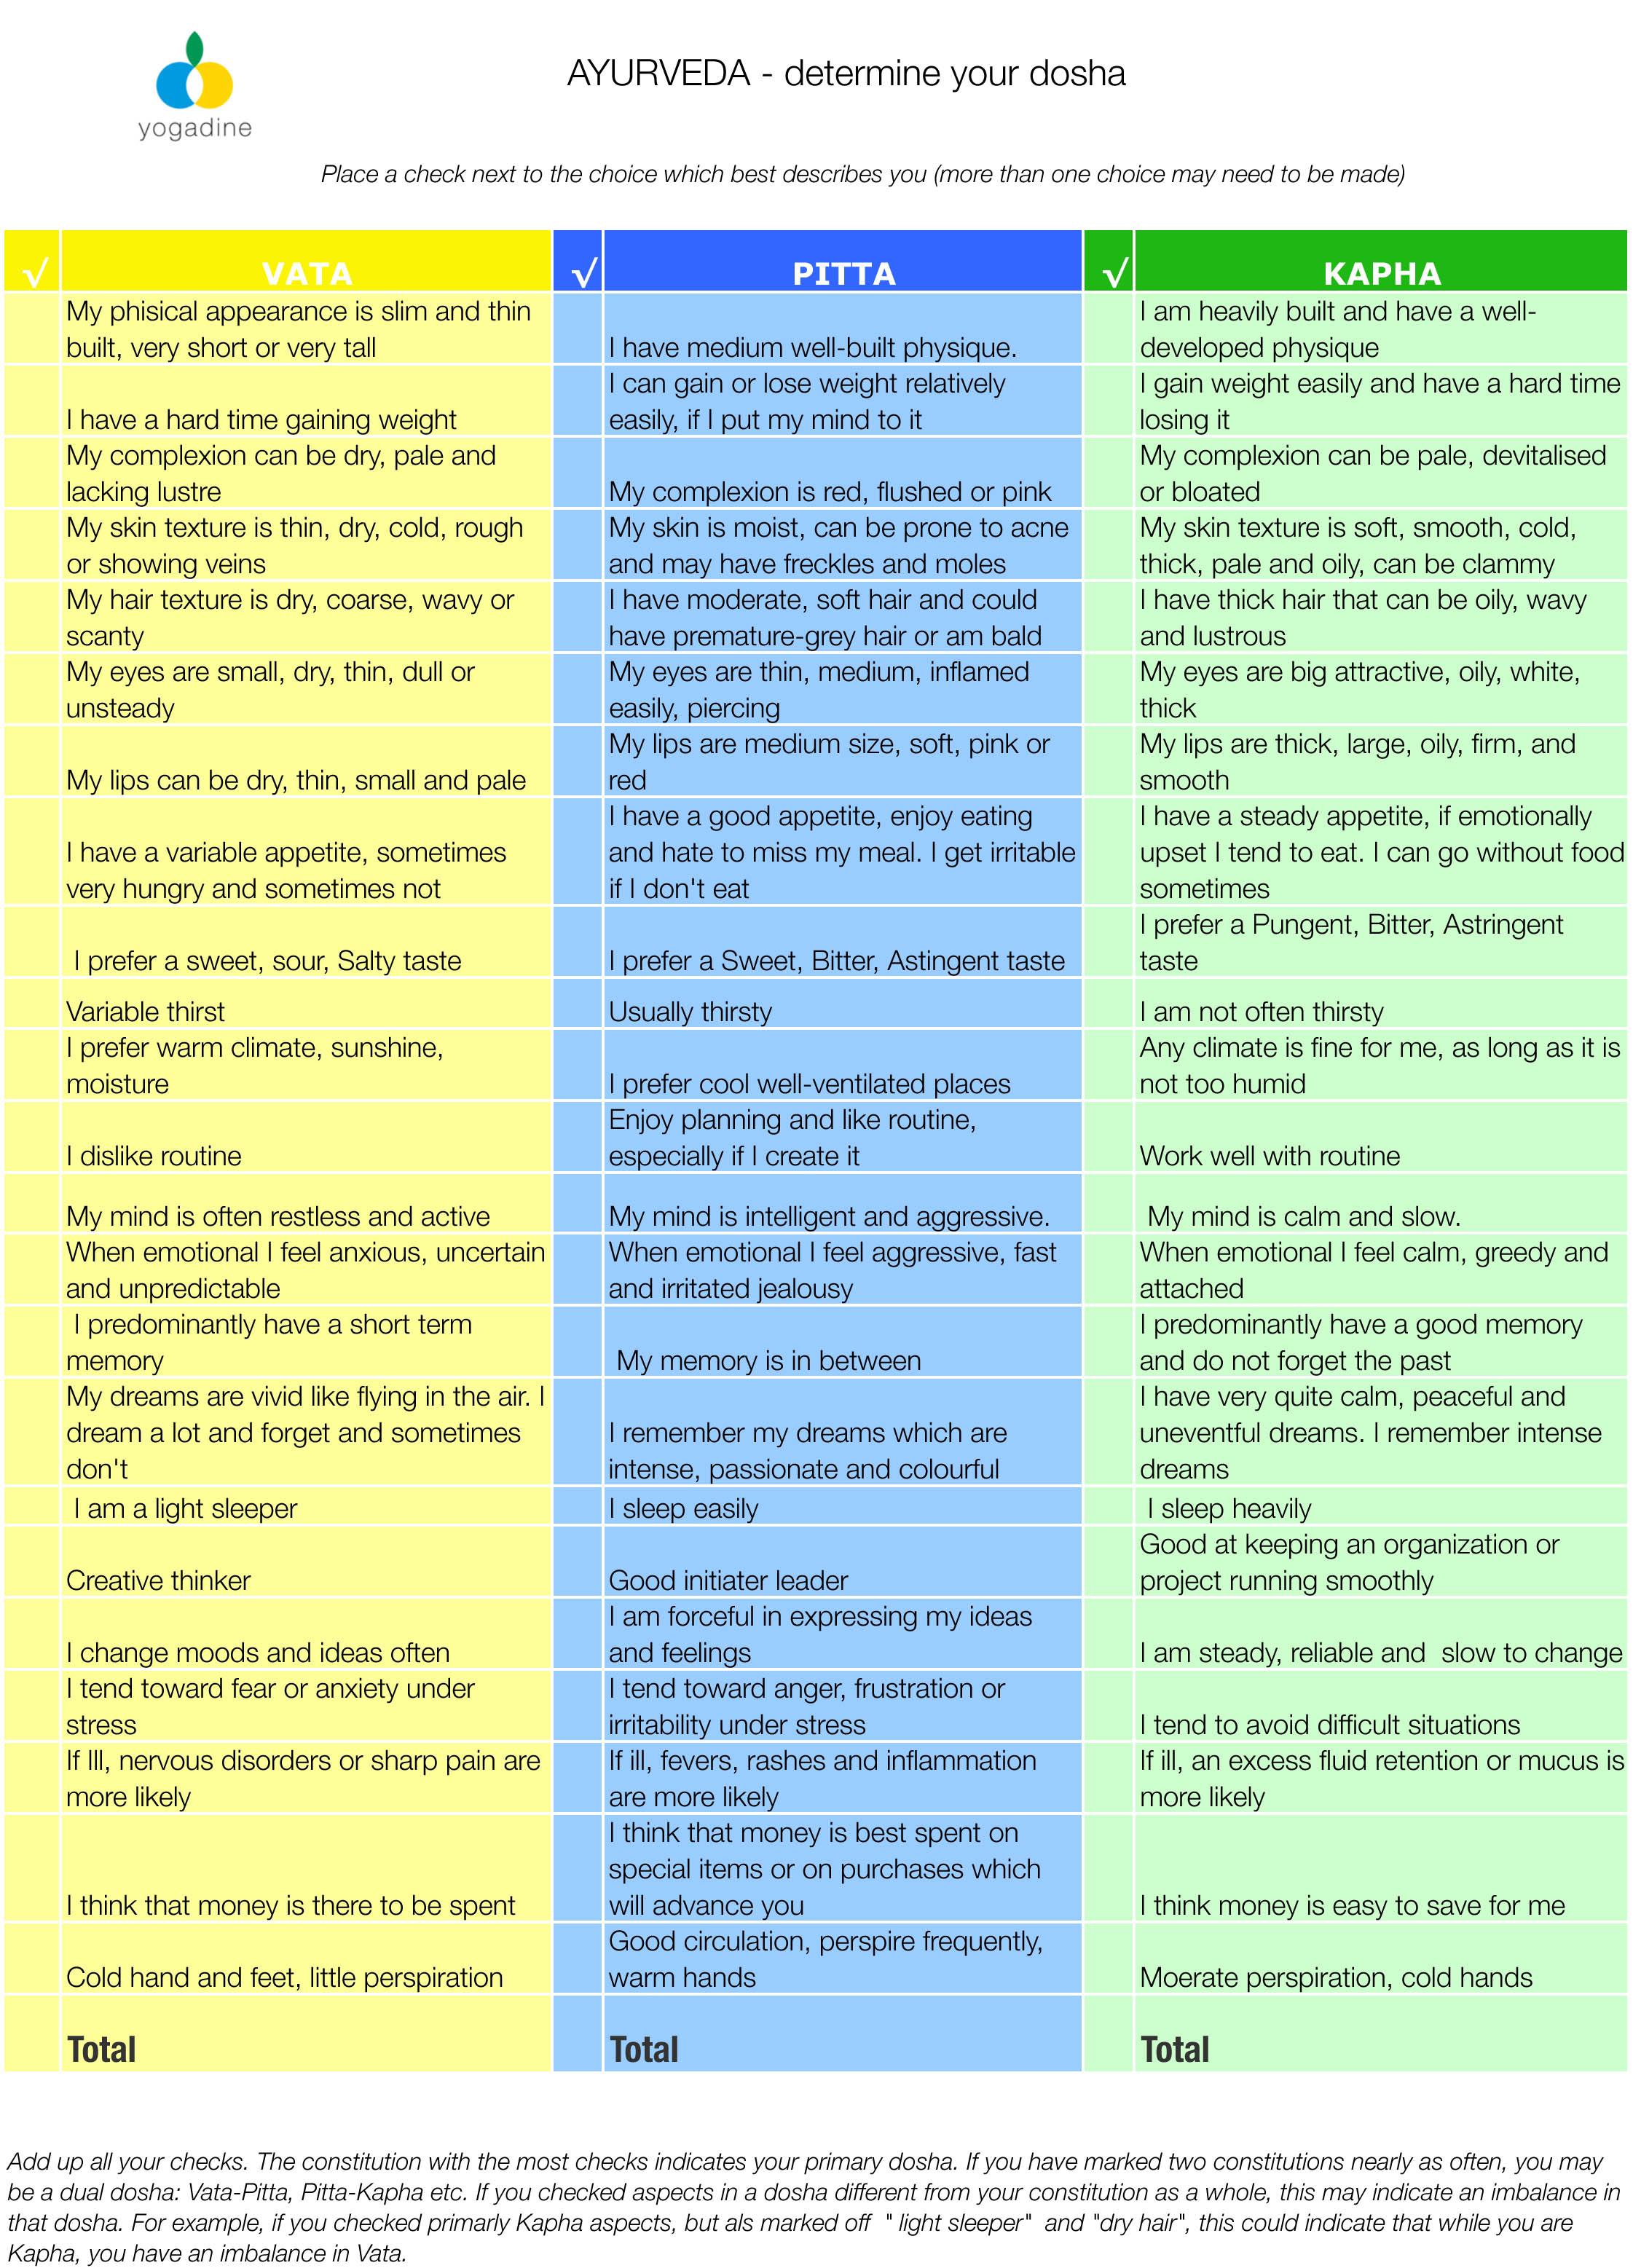 Ayurveda determine your dosha yogadine doshas yogadine forumfinder Images